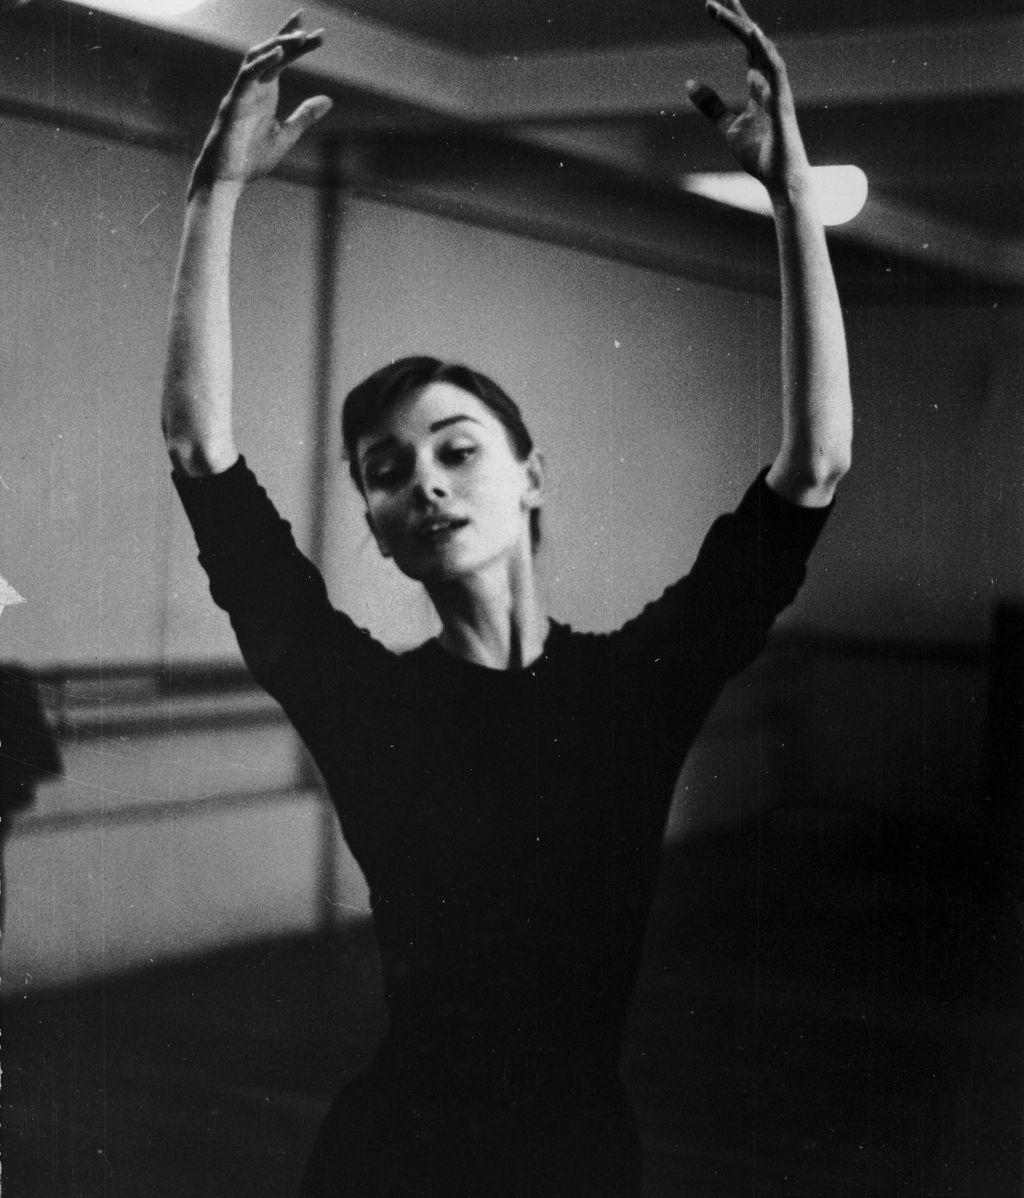 Audrey Hepburn, en un estudio de danza (1955)